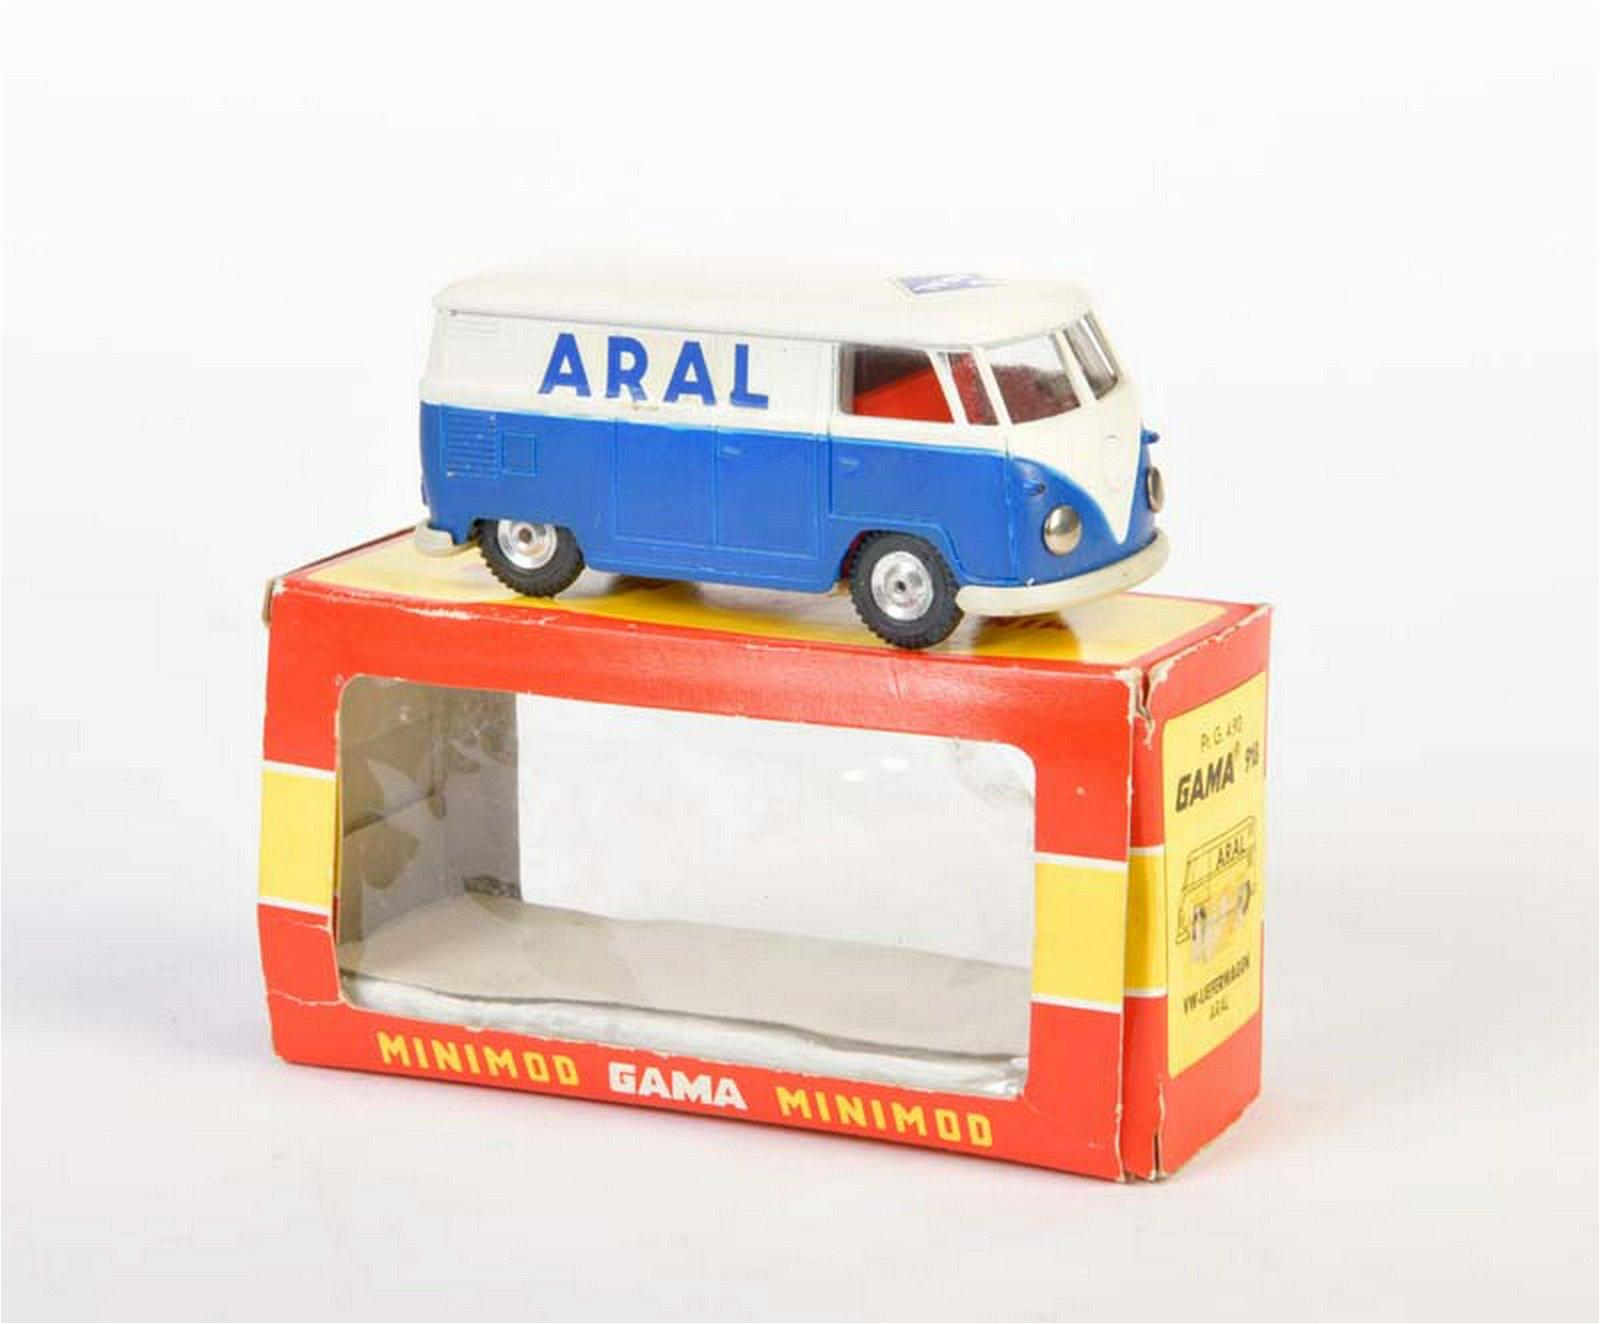 Gama, Minimod VW Bus ARAL